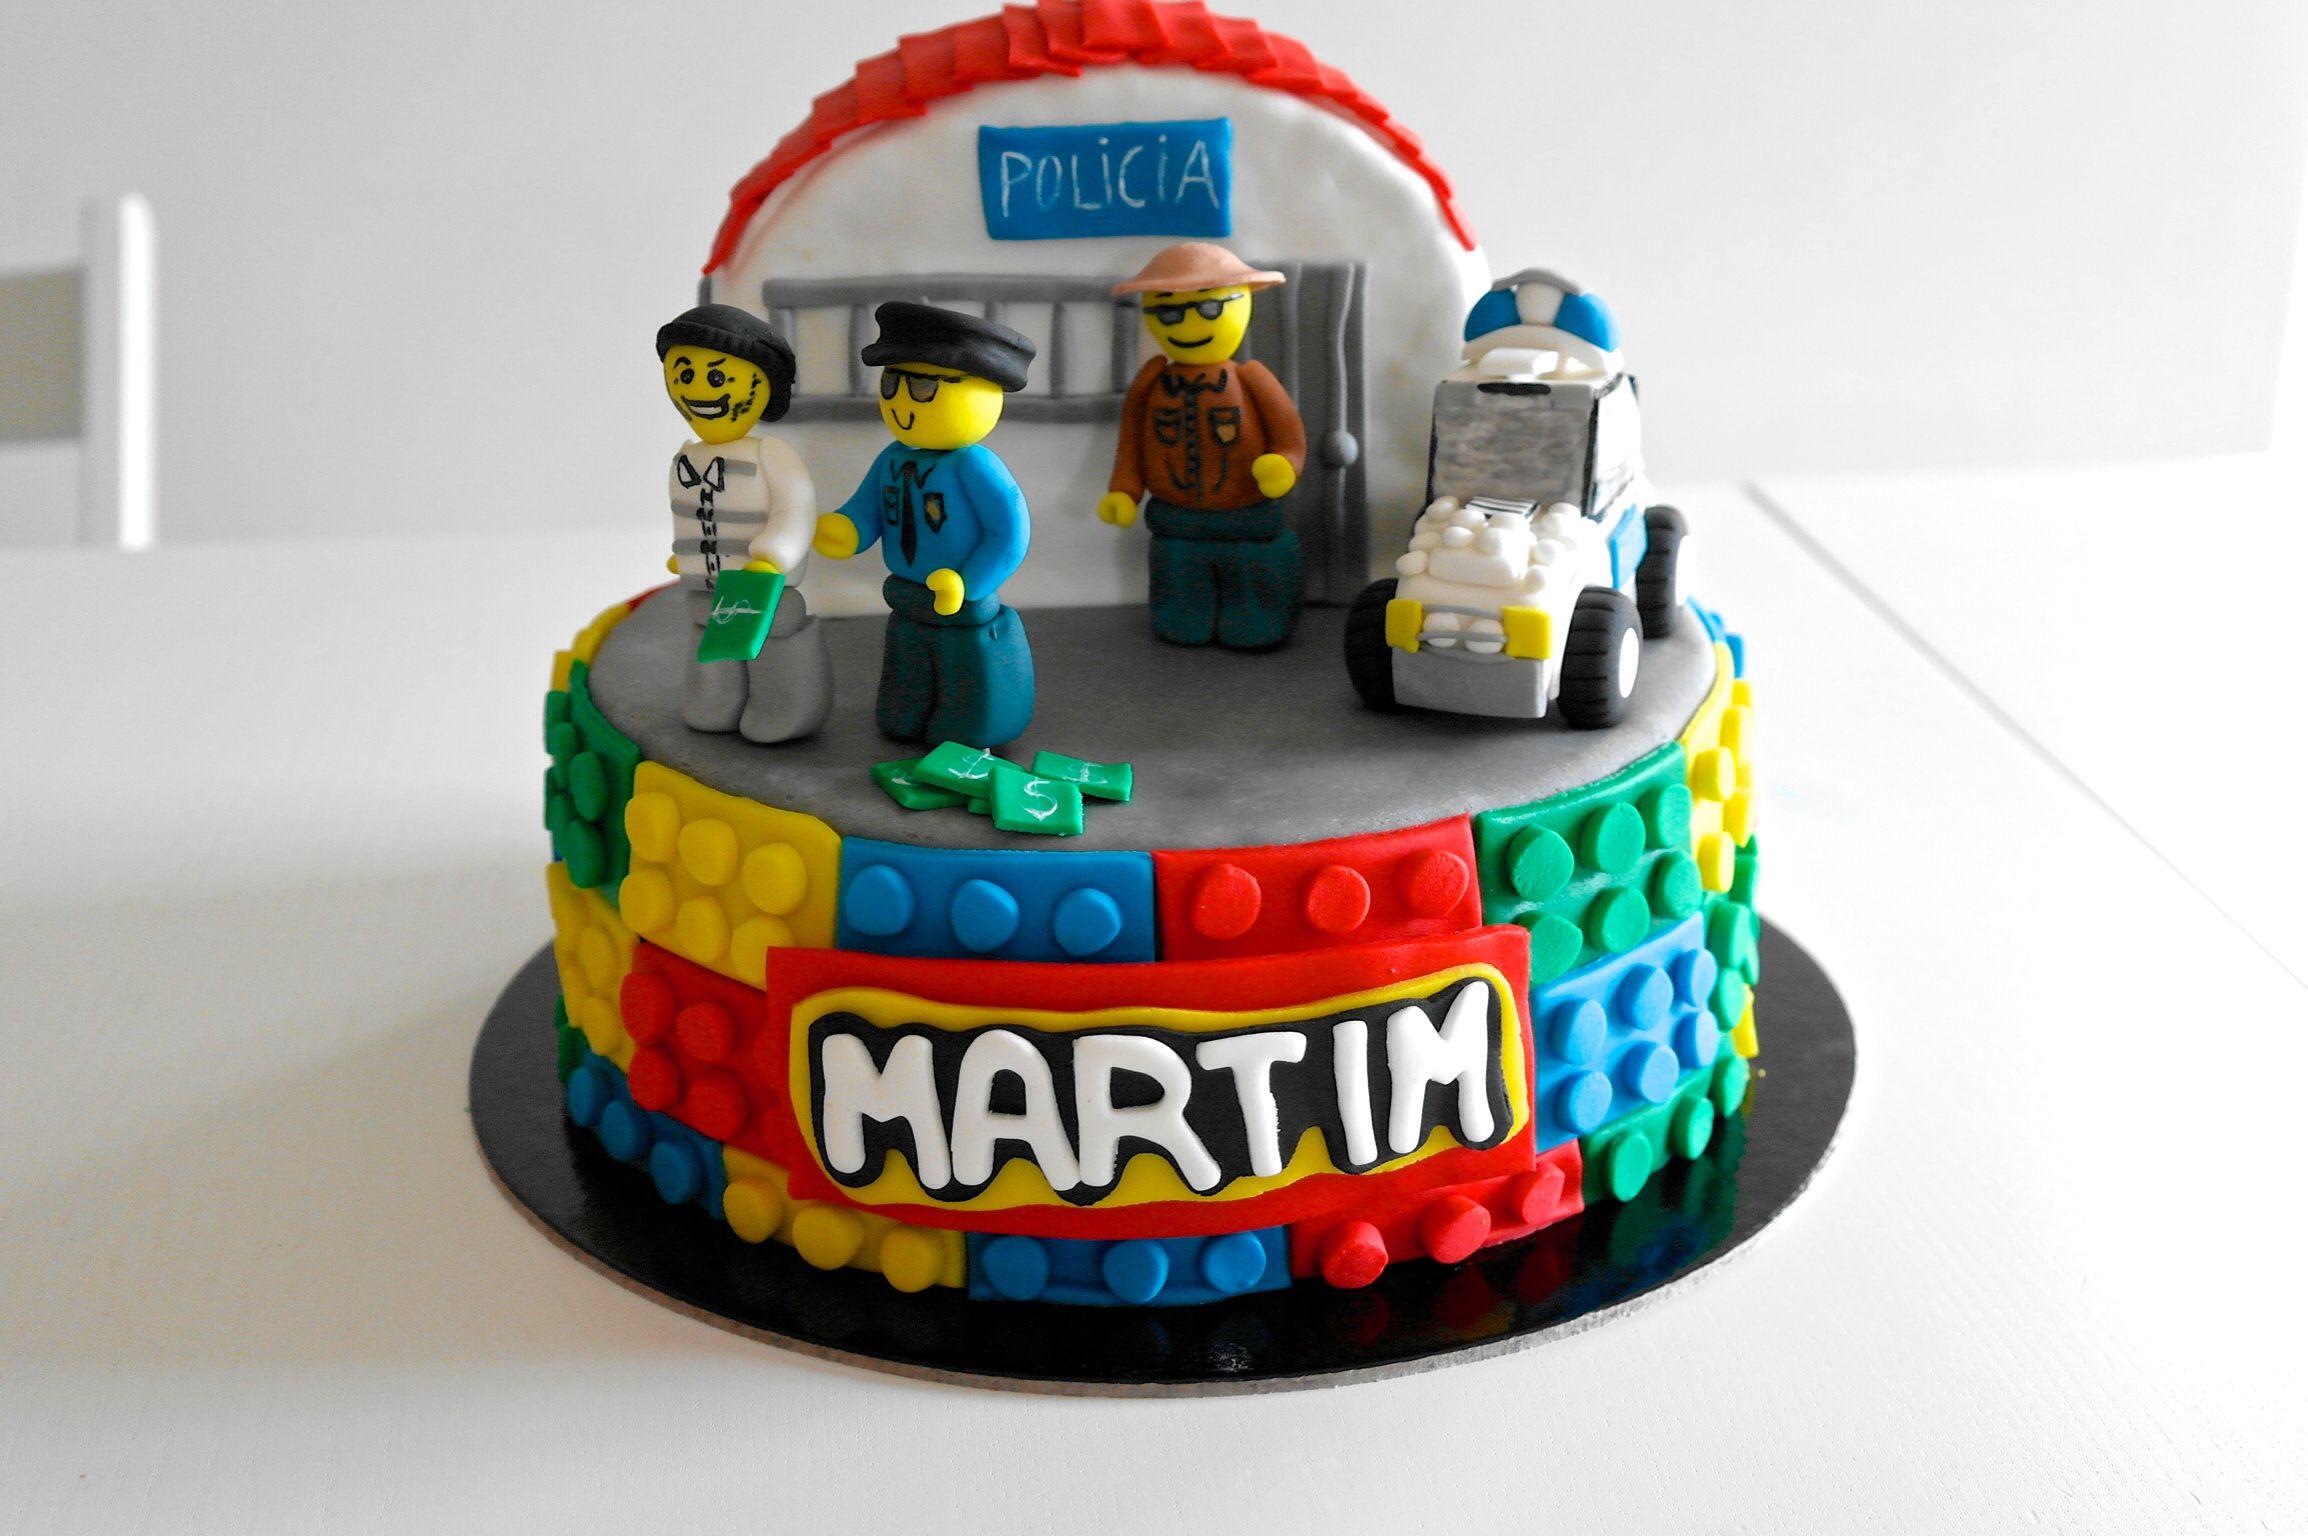 Lego police cake design My cakes Pinterest Police ...